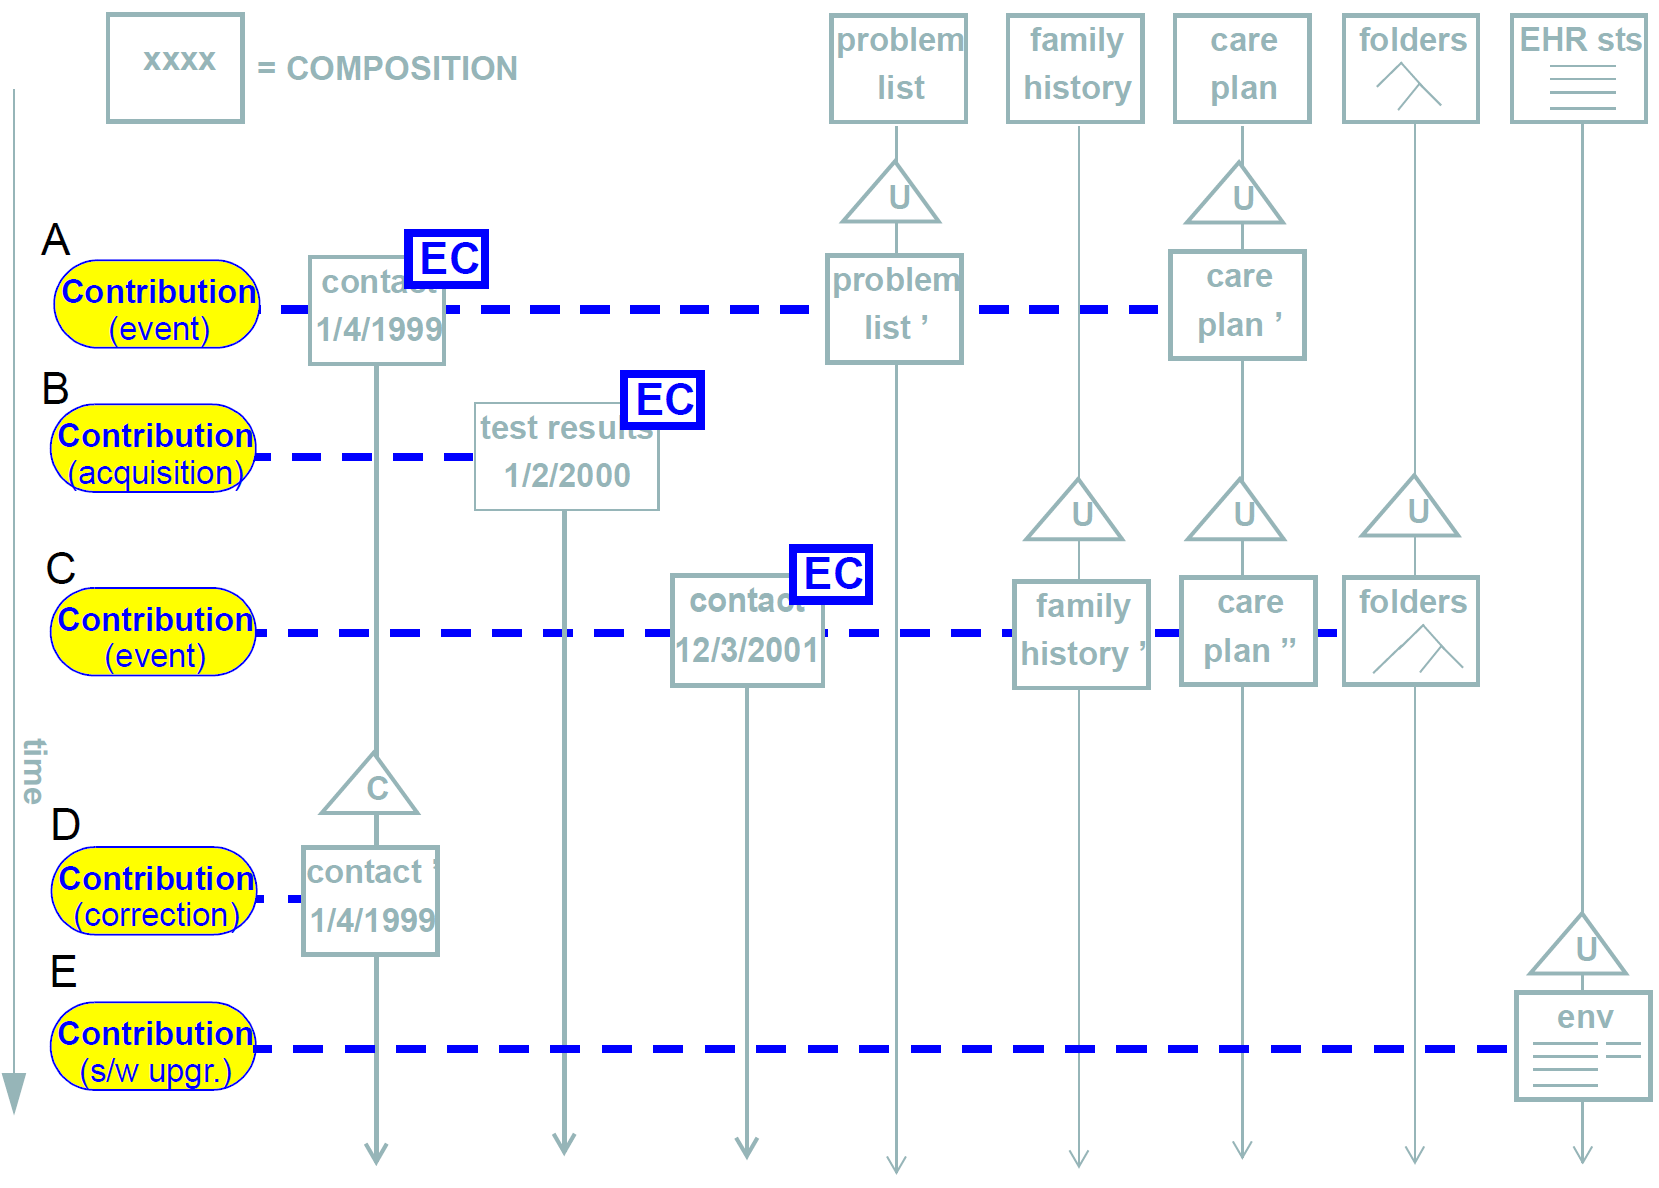 ehr information model